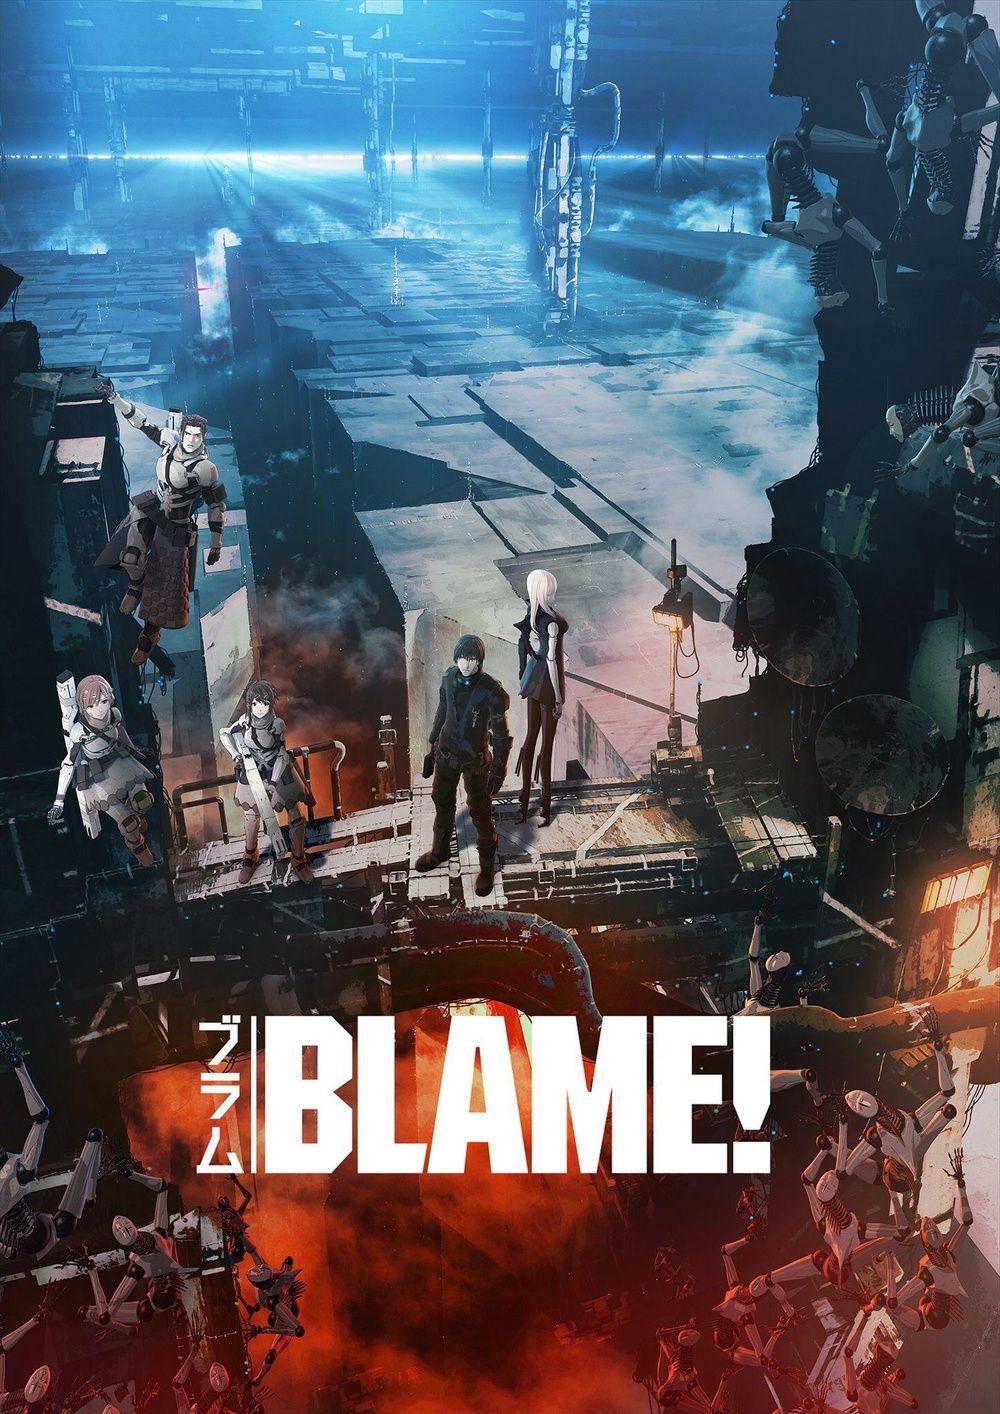 Blame 2019 Stream